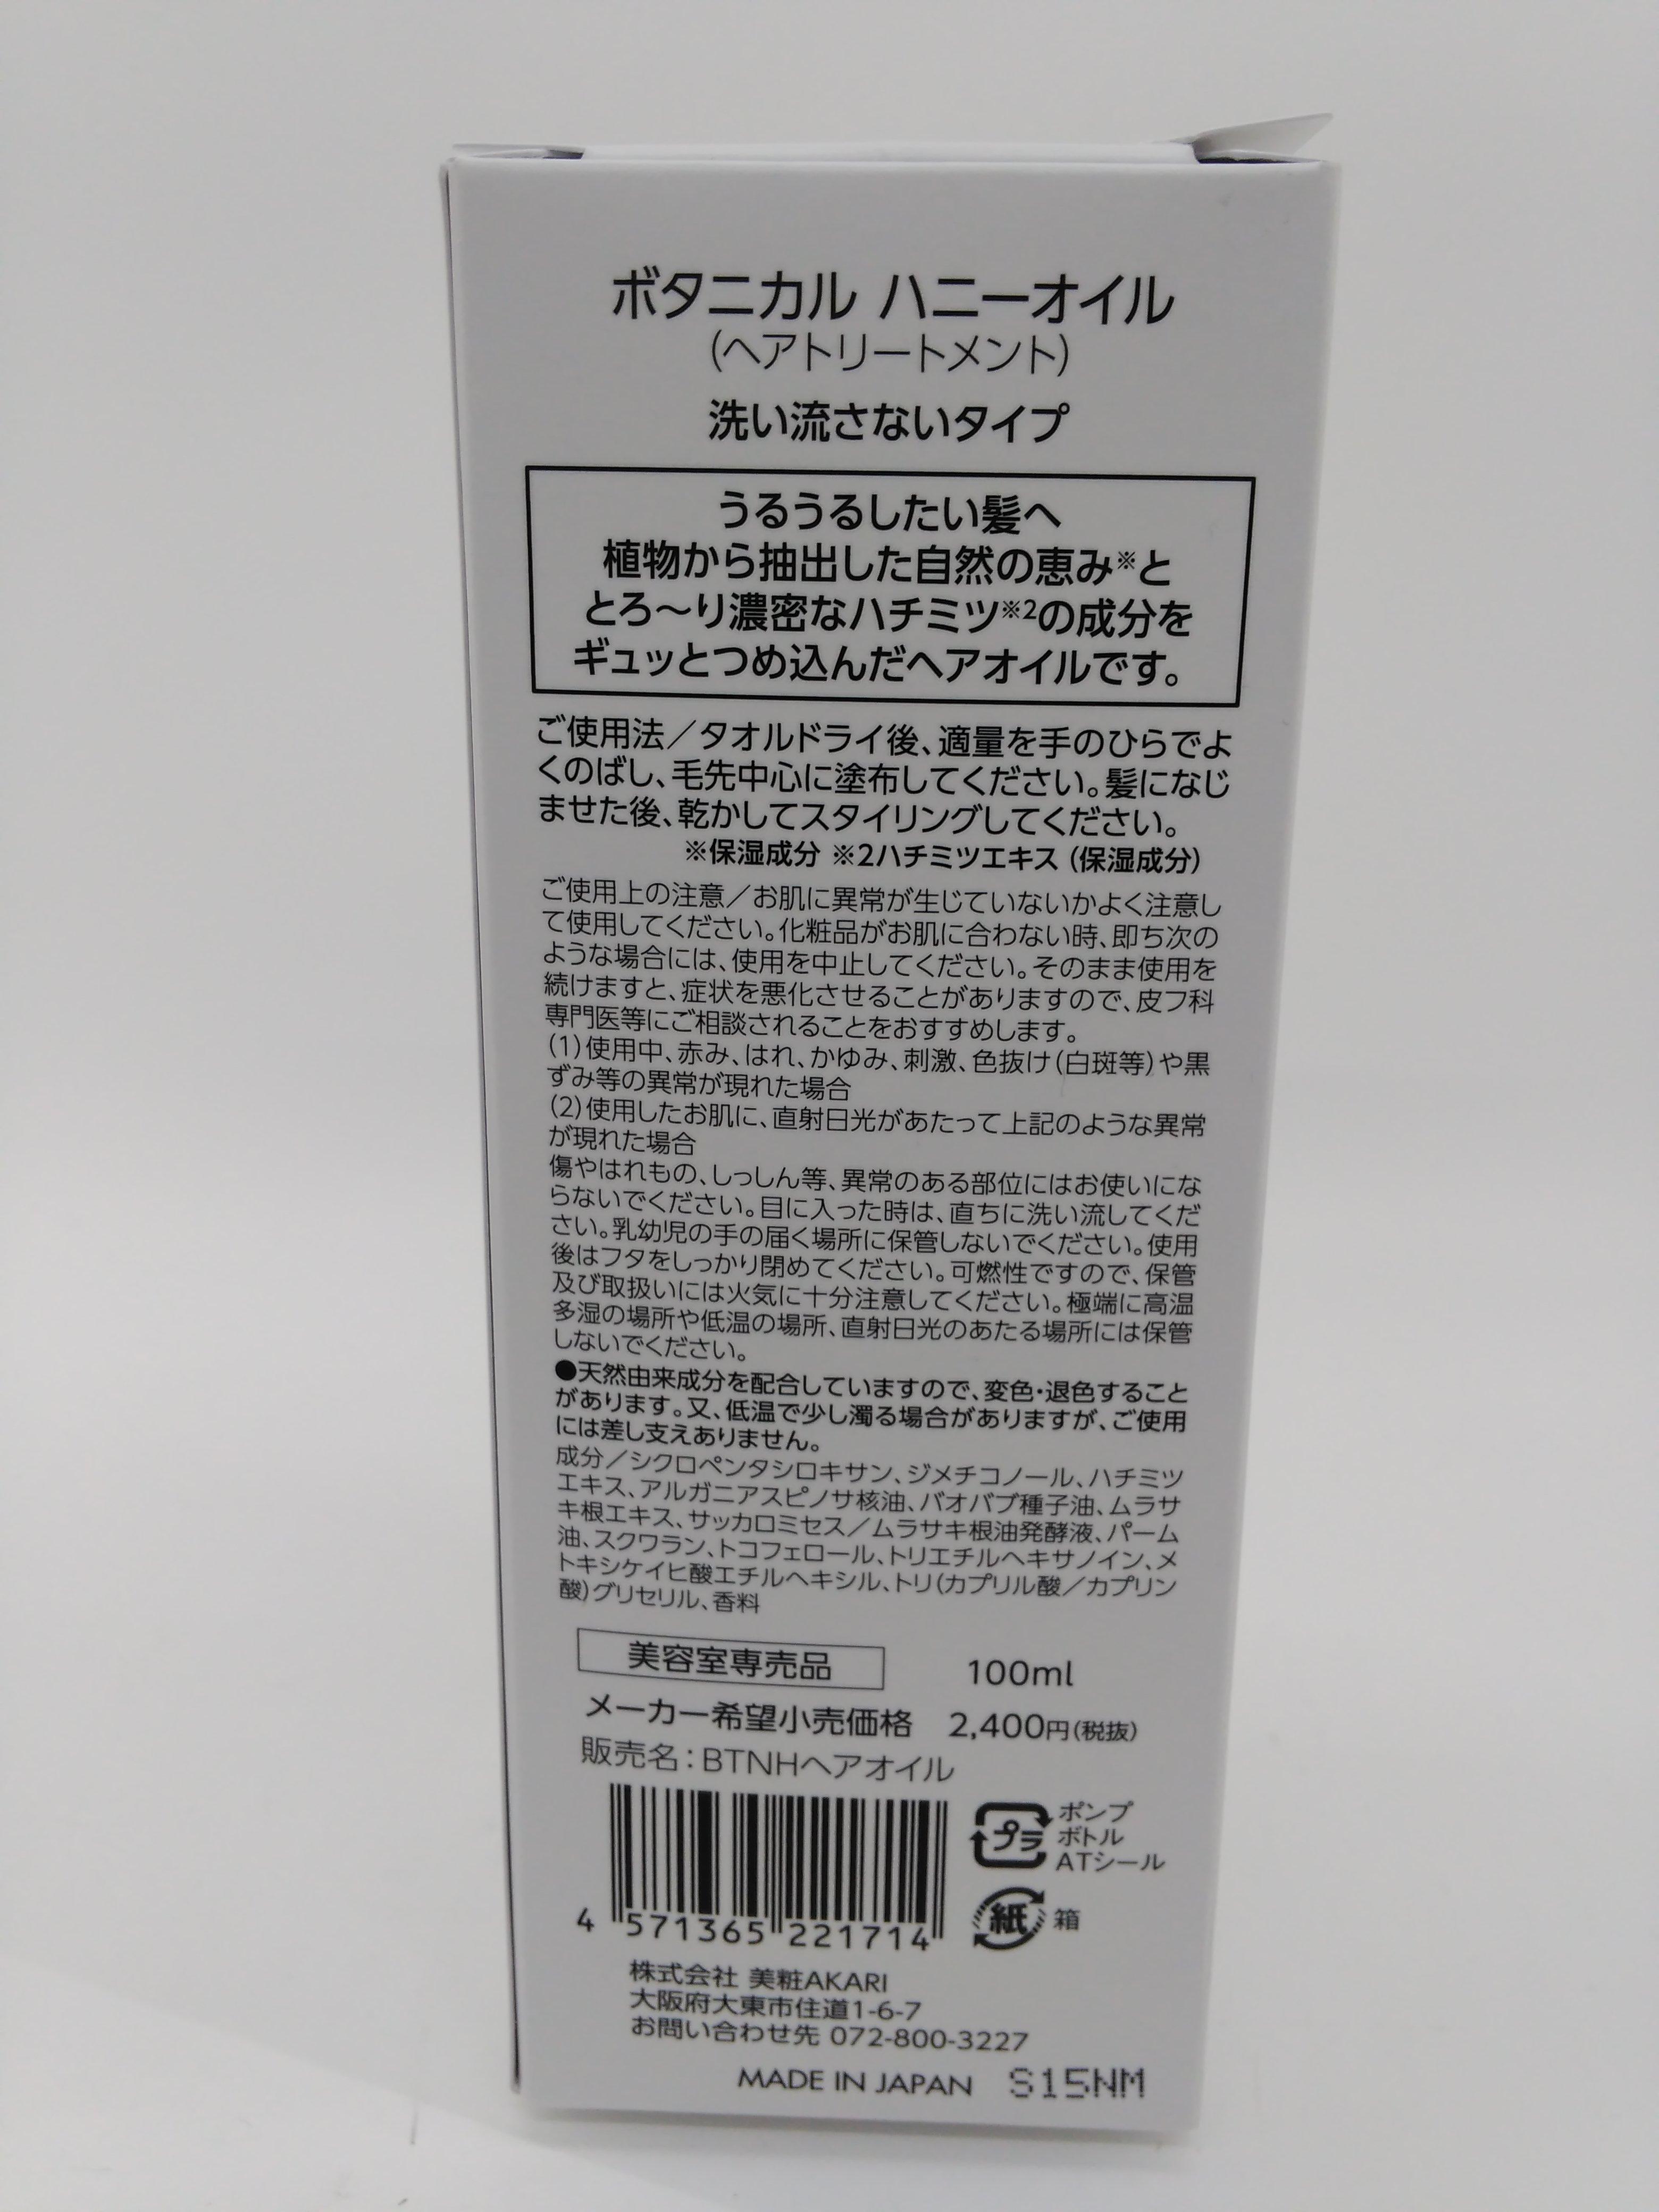 【TAKEYAスマイル便 対象品】ボタニカル ハニーヘアオイル 100ml